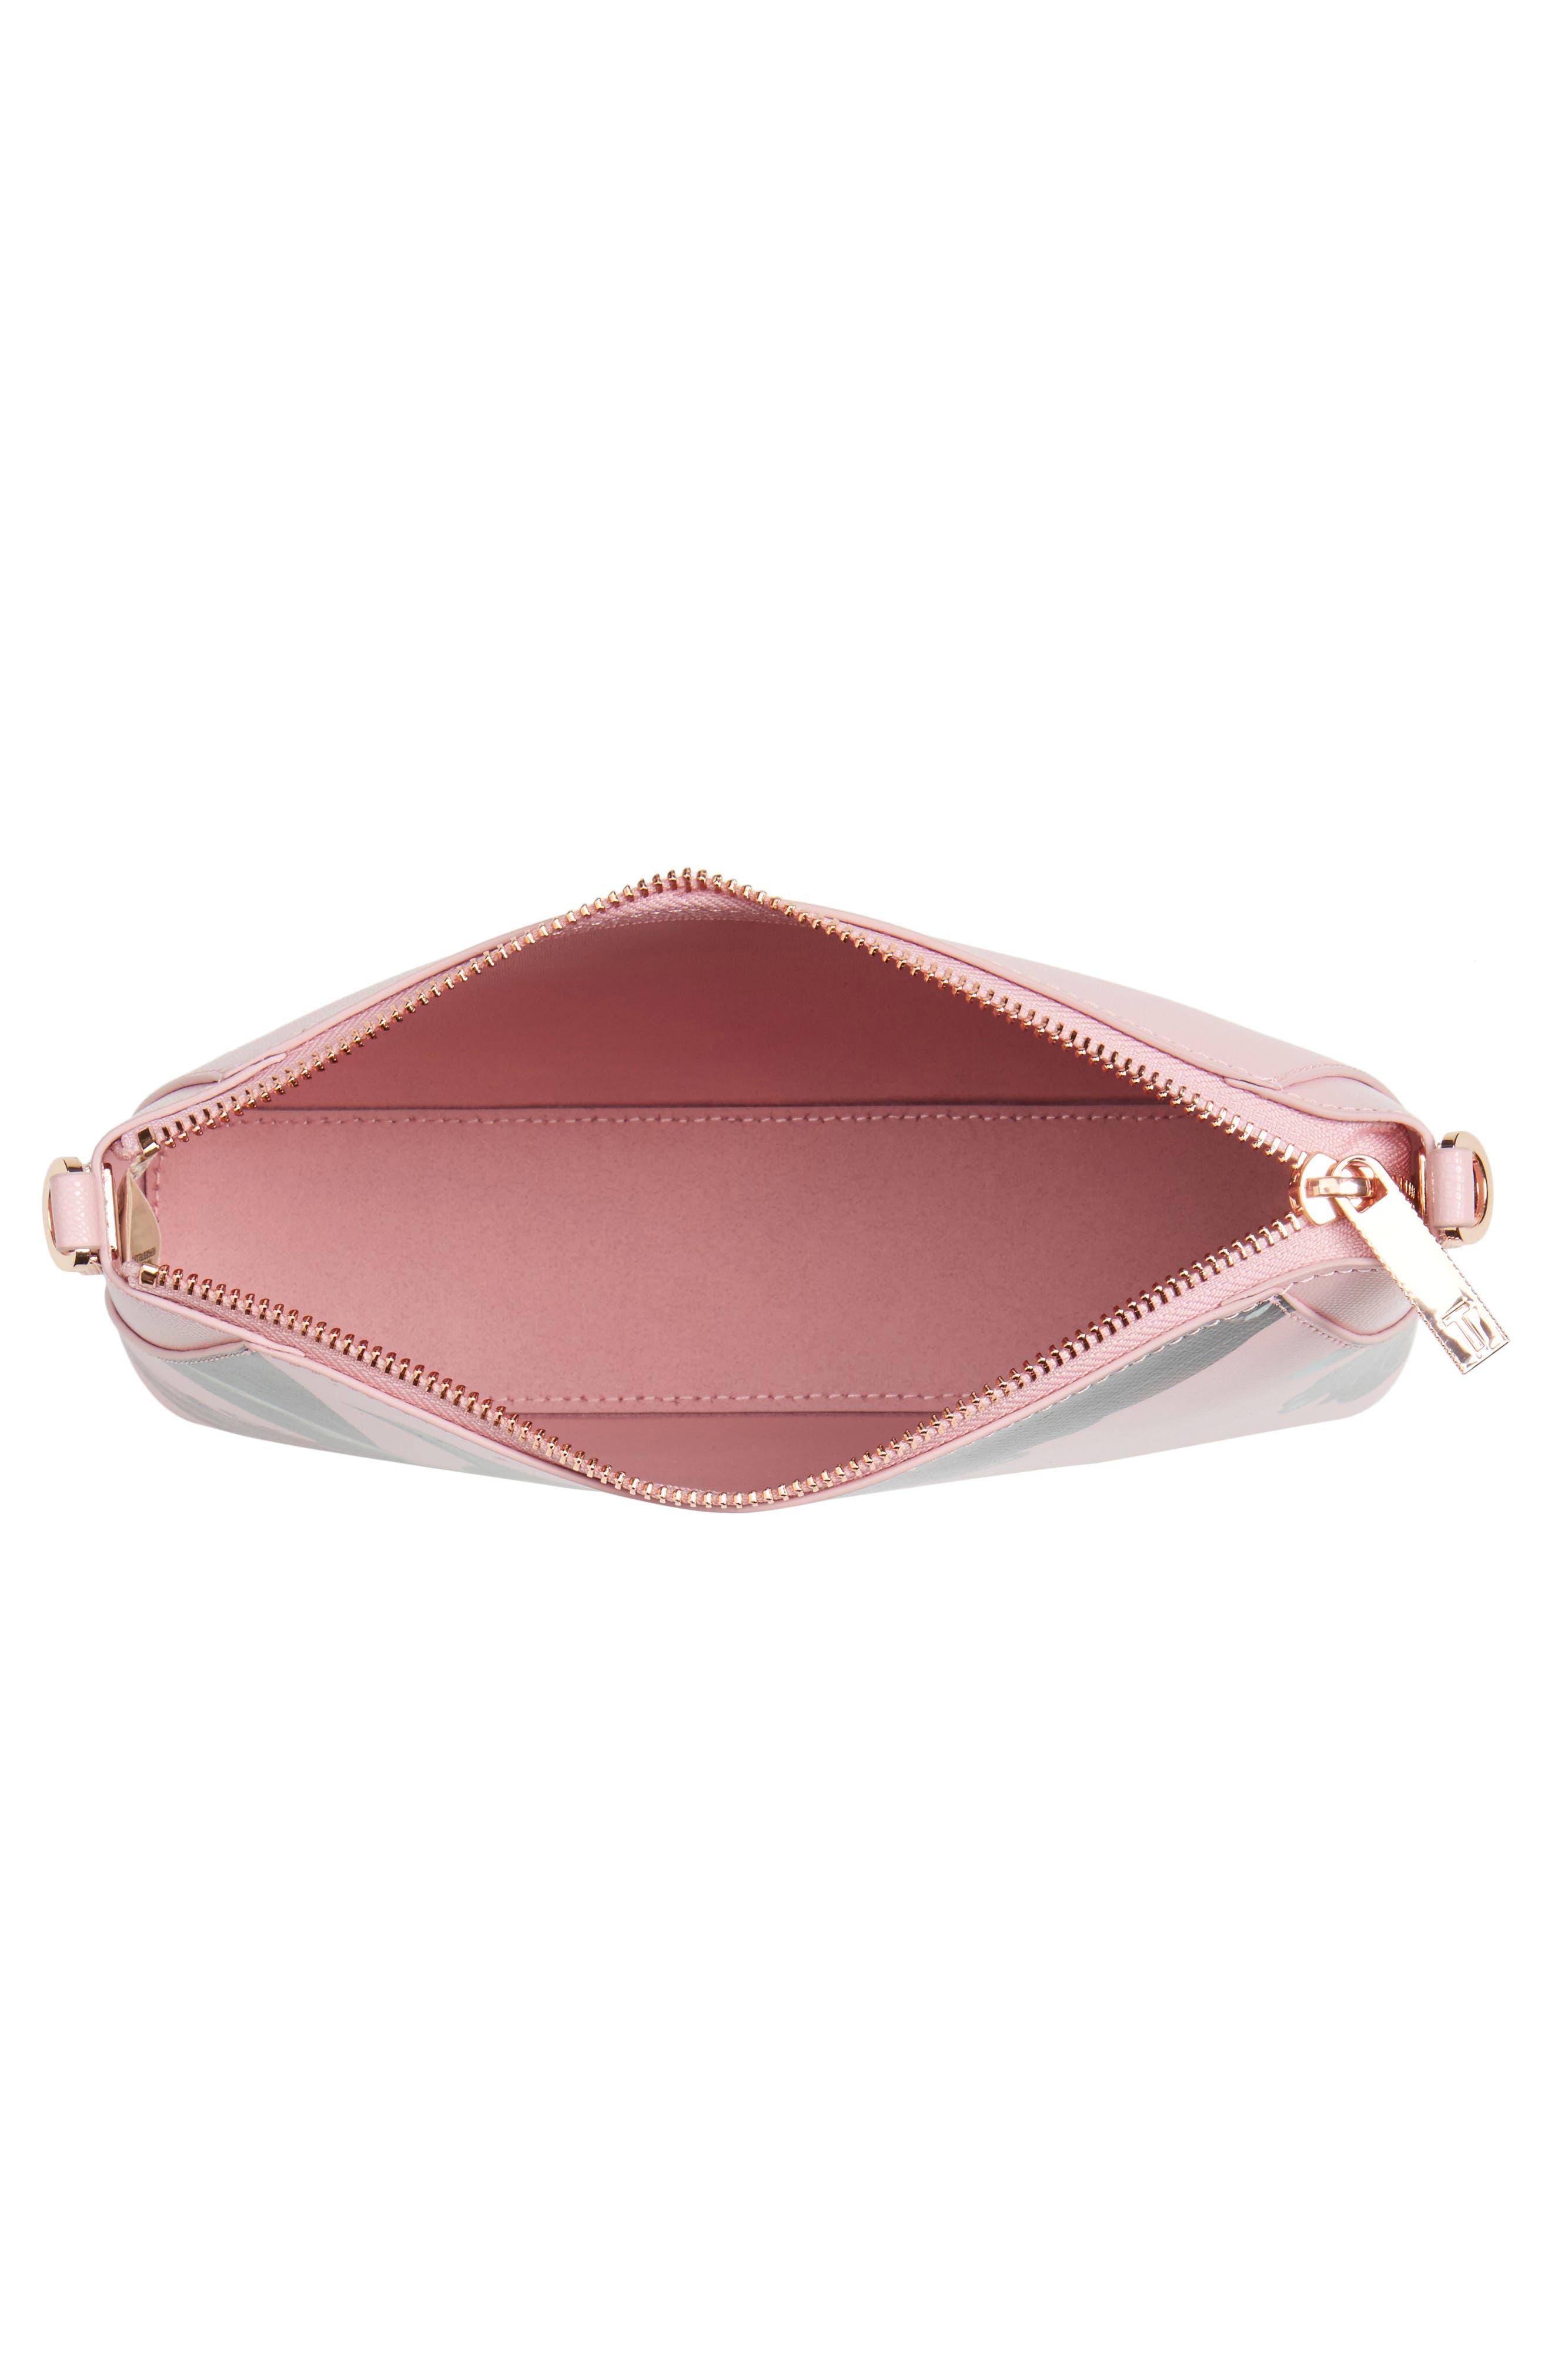 Julisa Eden Crossbody Bag,                             Alternate thumbnail 3, color,                             Pale Pink